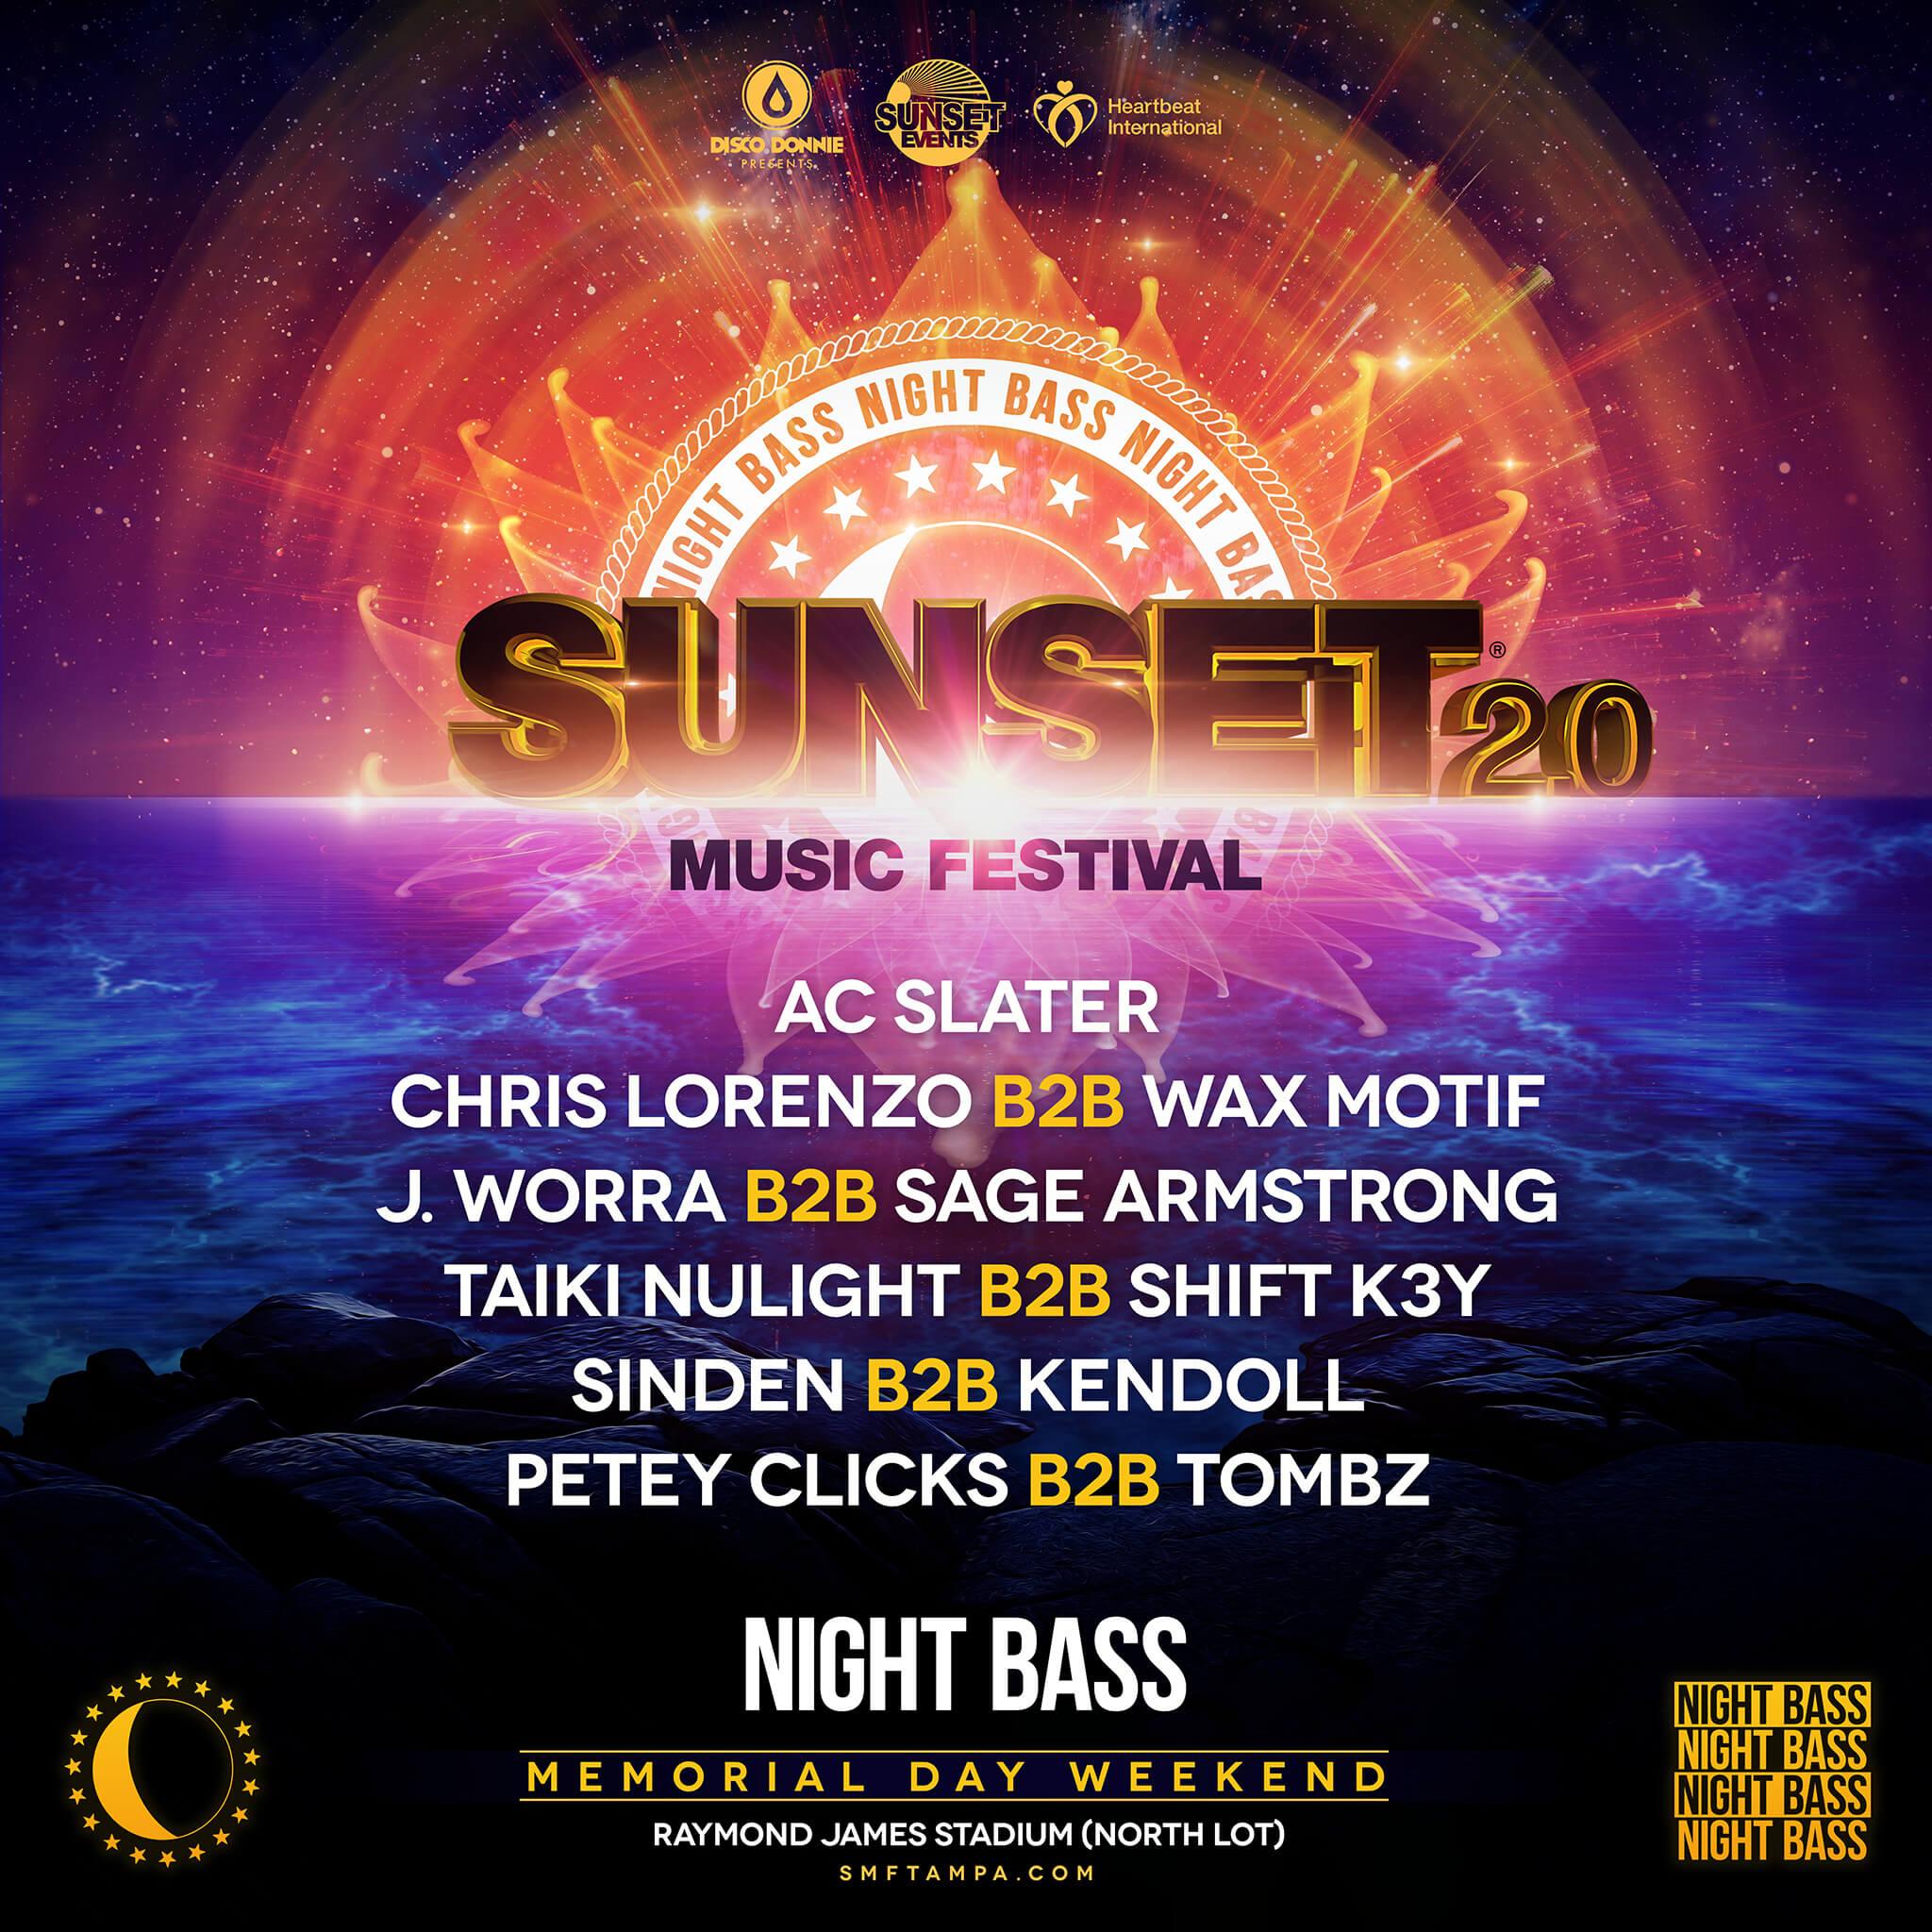 night bass lineup at sunset music festival 2020